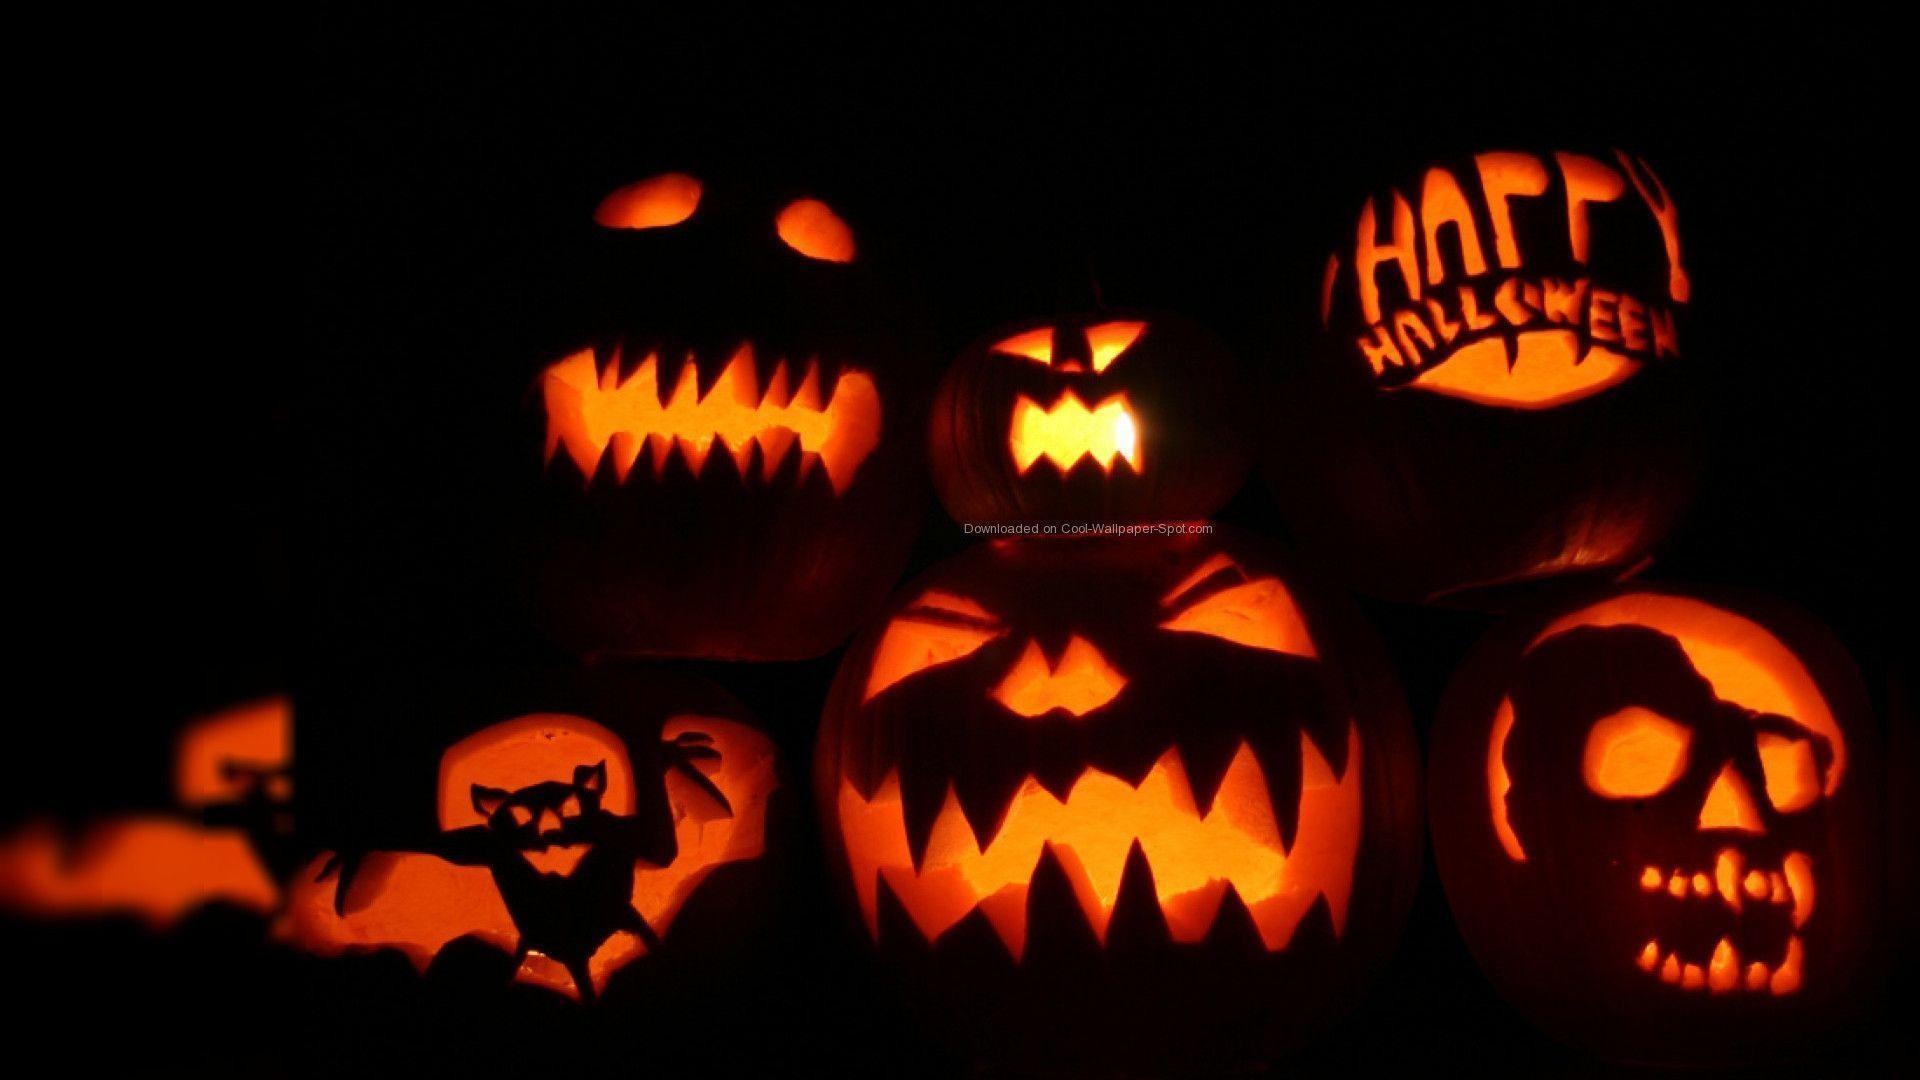 Live Halloween Wallpaper For Desktop 62 Images